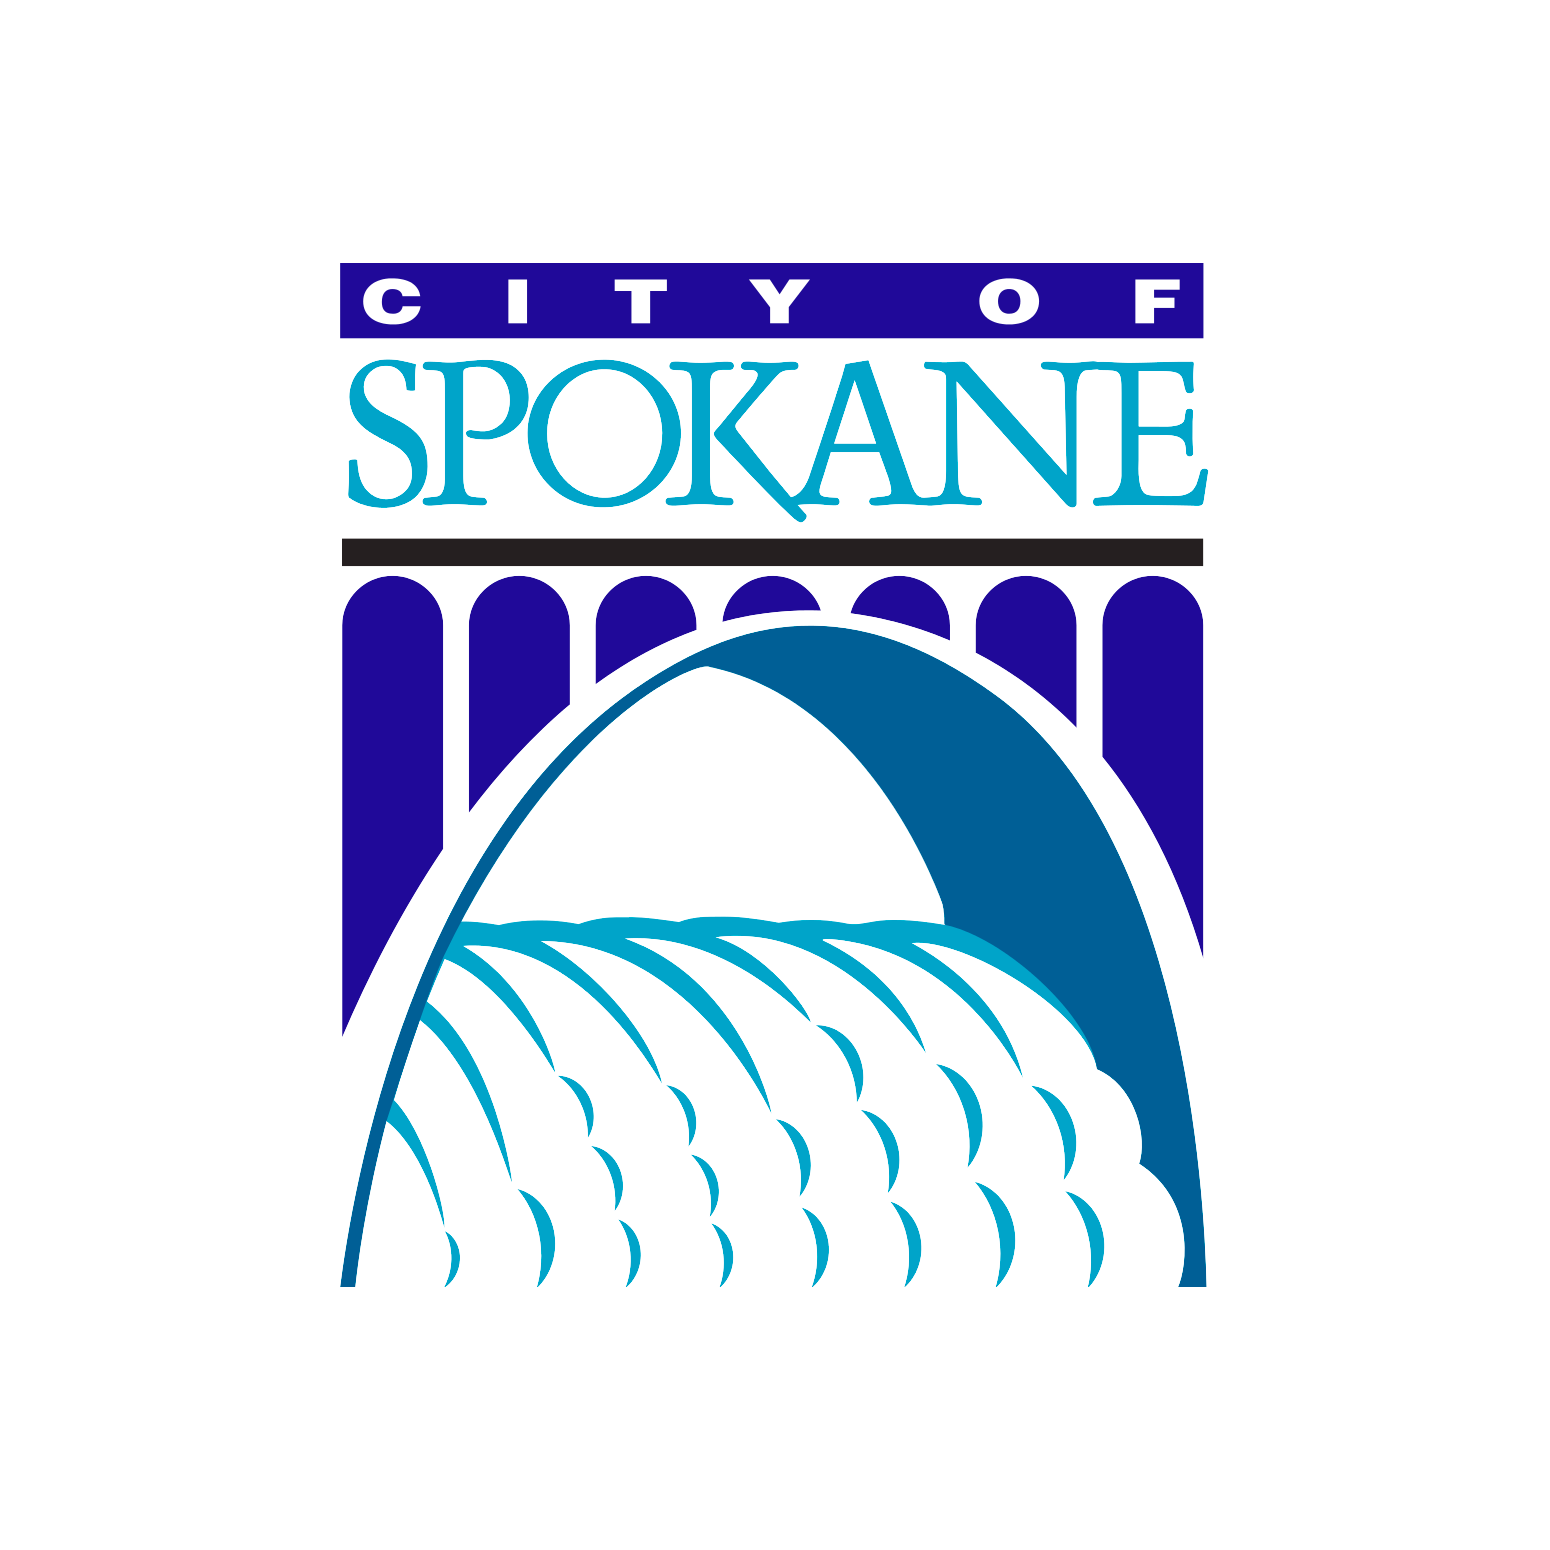 locomobi-spokane-logo-1500px